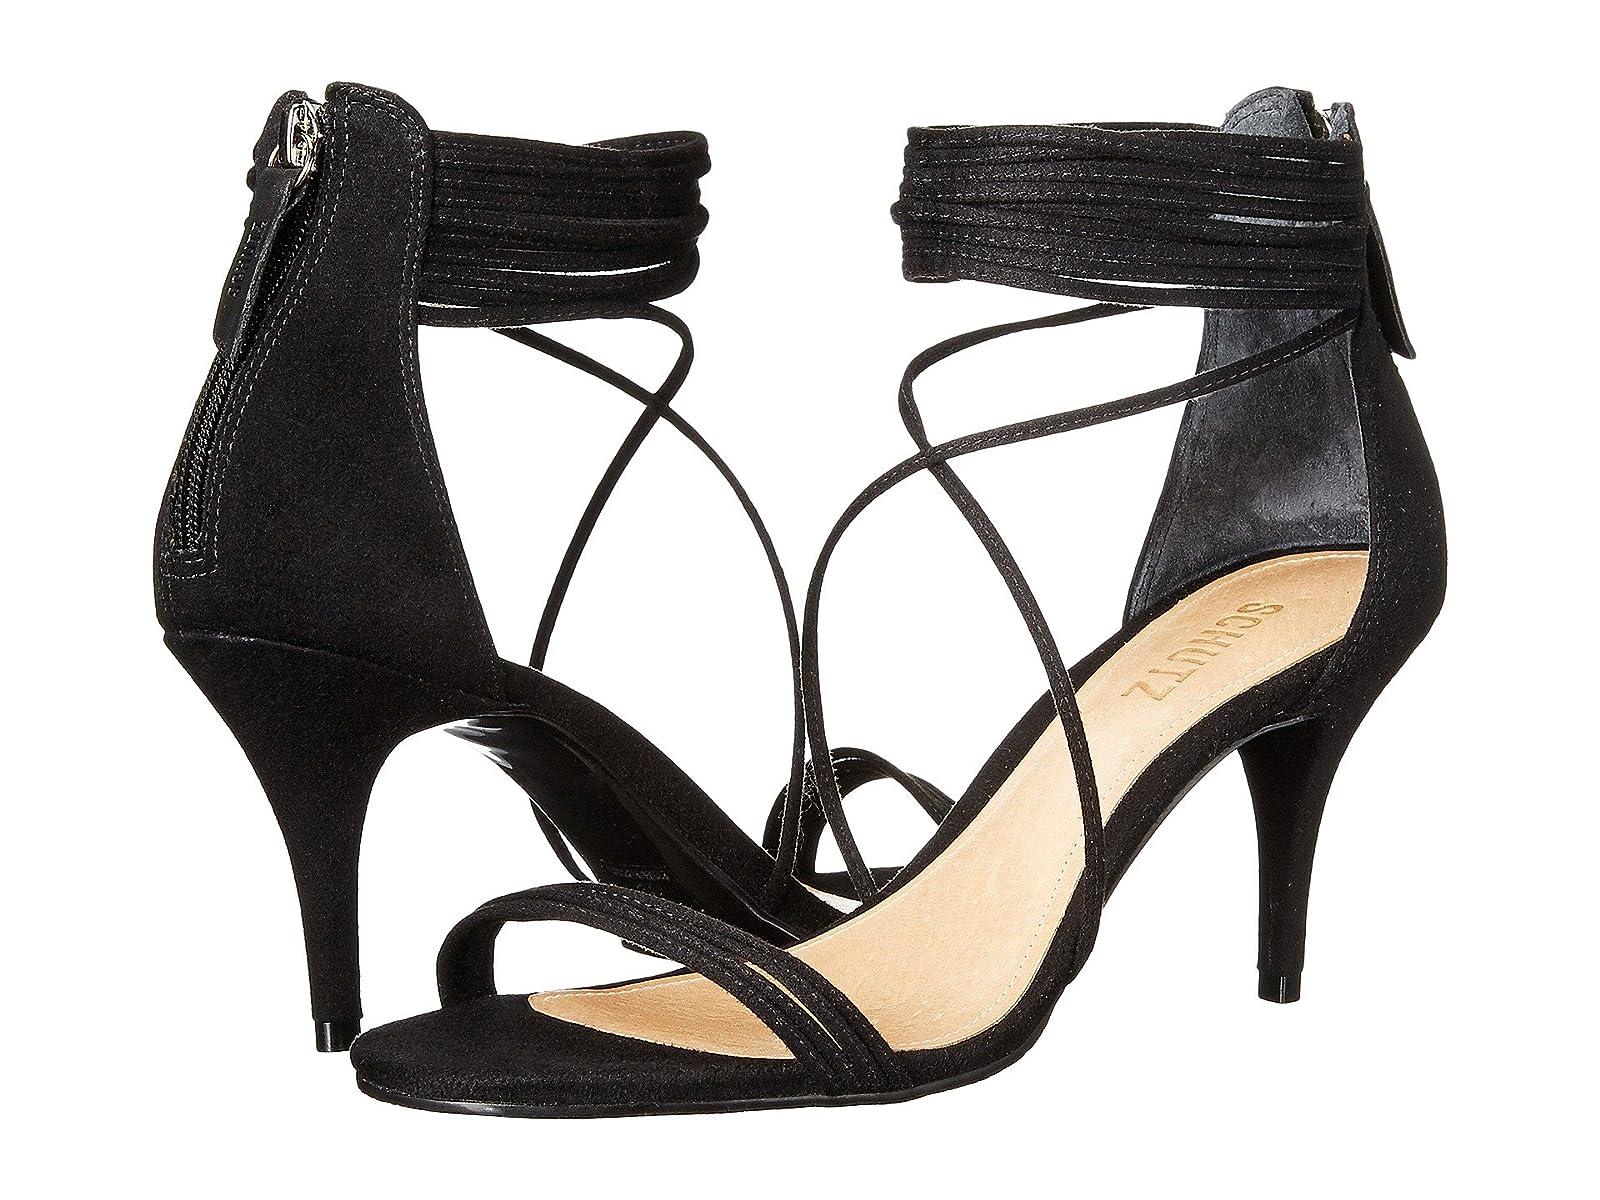 Schutz ViolitaCheap and distinctive eye-catching shoes